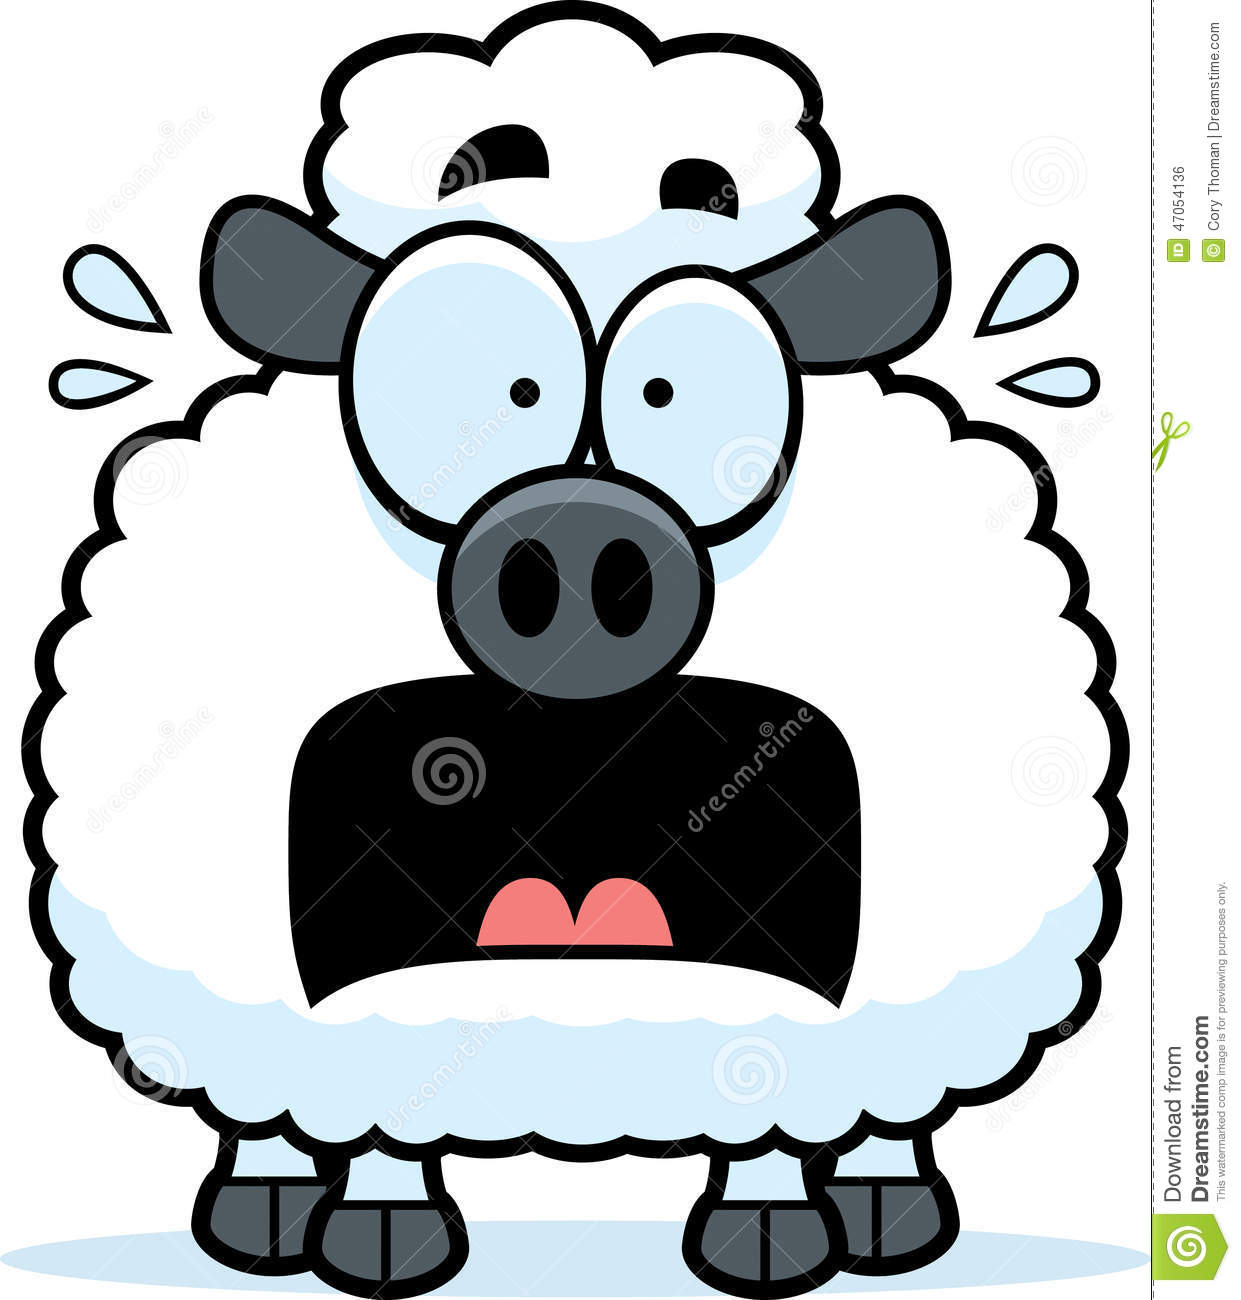 Name:  scared-little-lamb-cartoon-illustration-looking-47054136.jpg Views: 295 Size:  119.6 KB